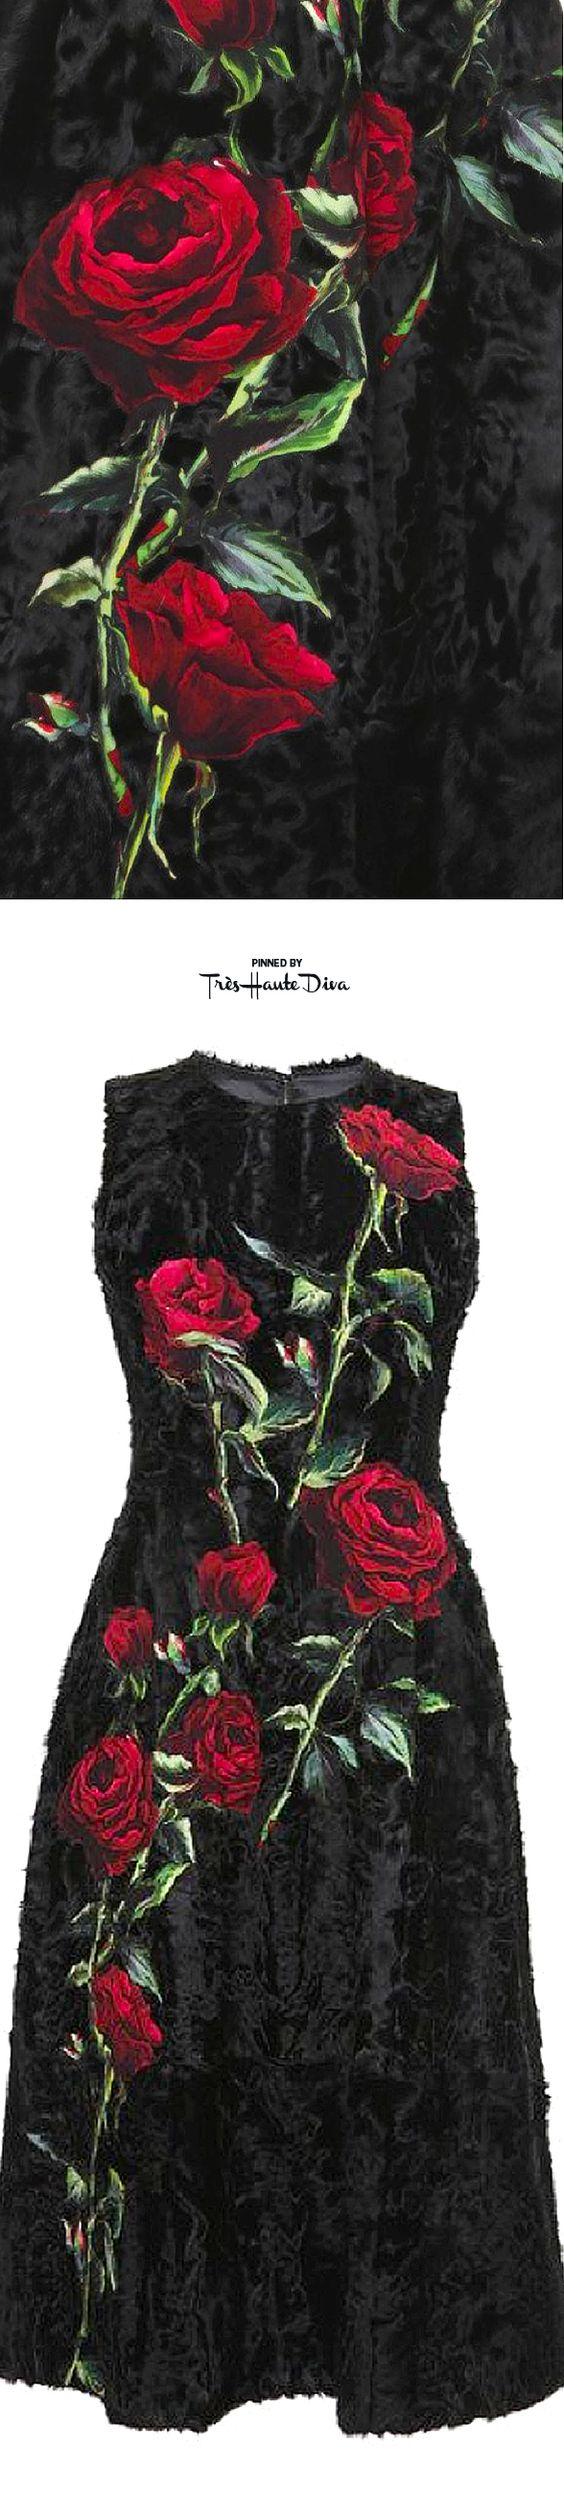 Dolce & Gabbana Fall 2015 Black Sleeveless Lamb Fur Dress With Rose ♔THD♔: